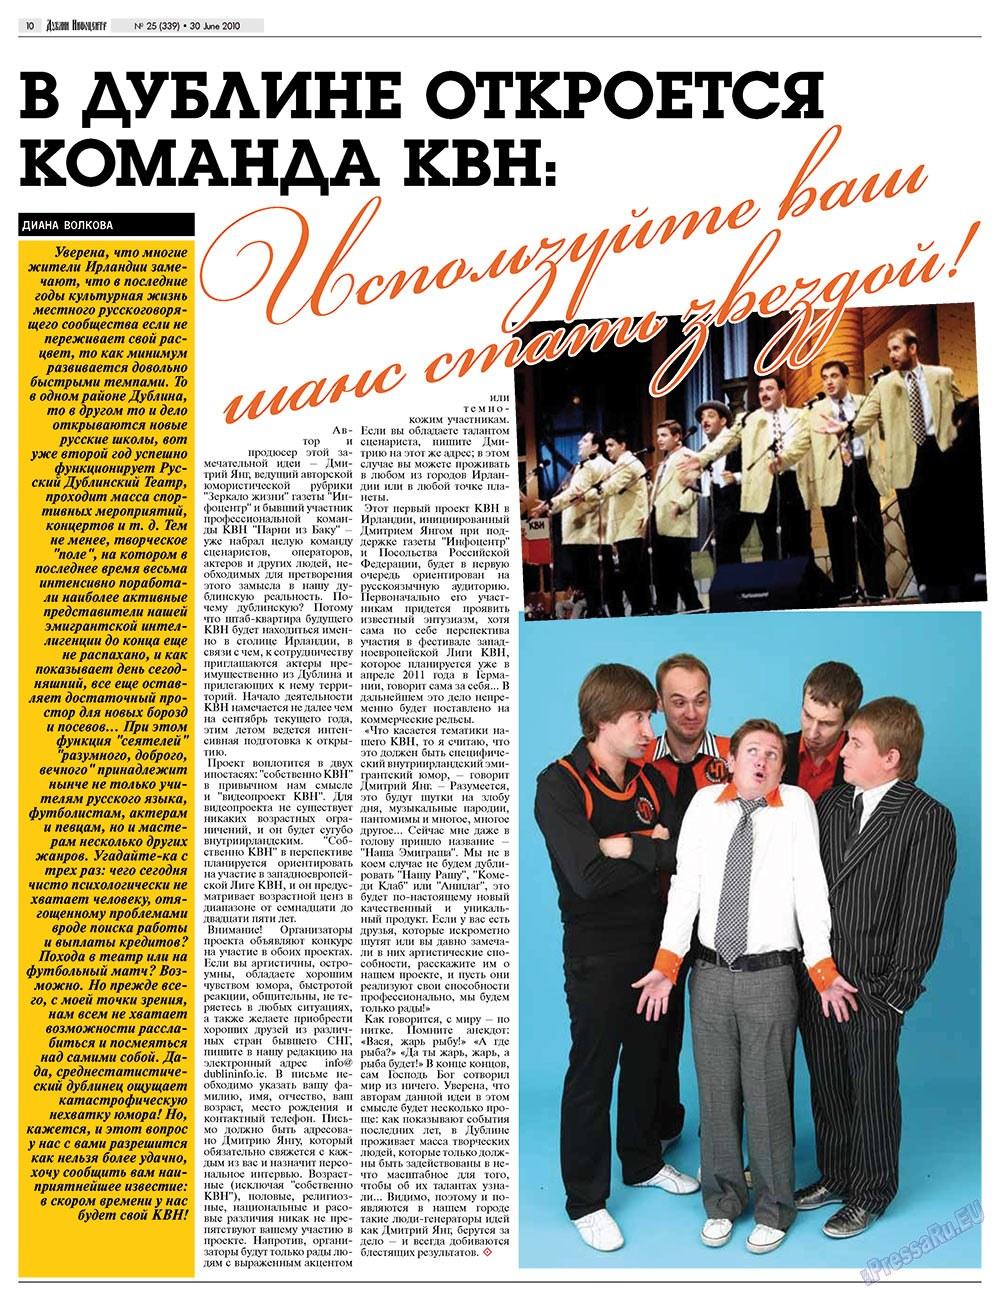 Дублин инфоцентр (газета). 2010 год, номер 25, стр. 10